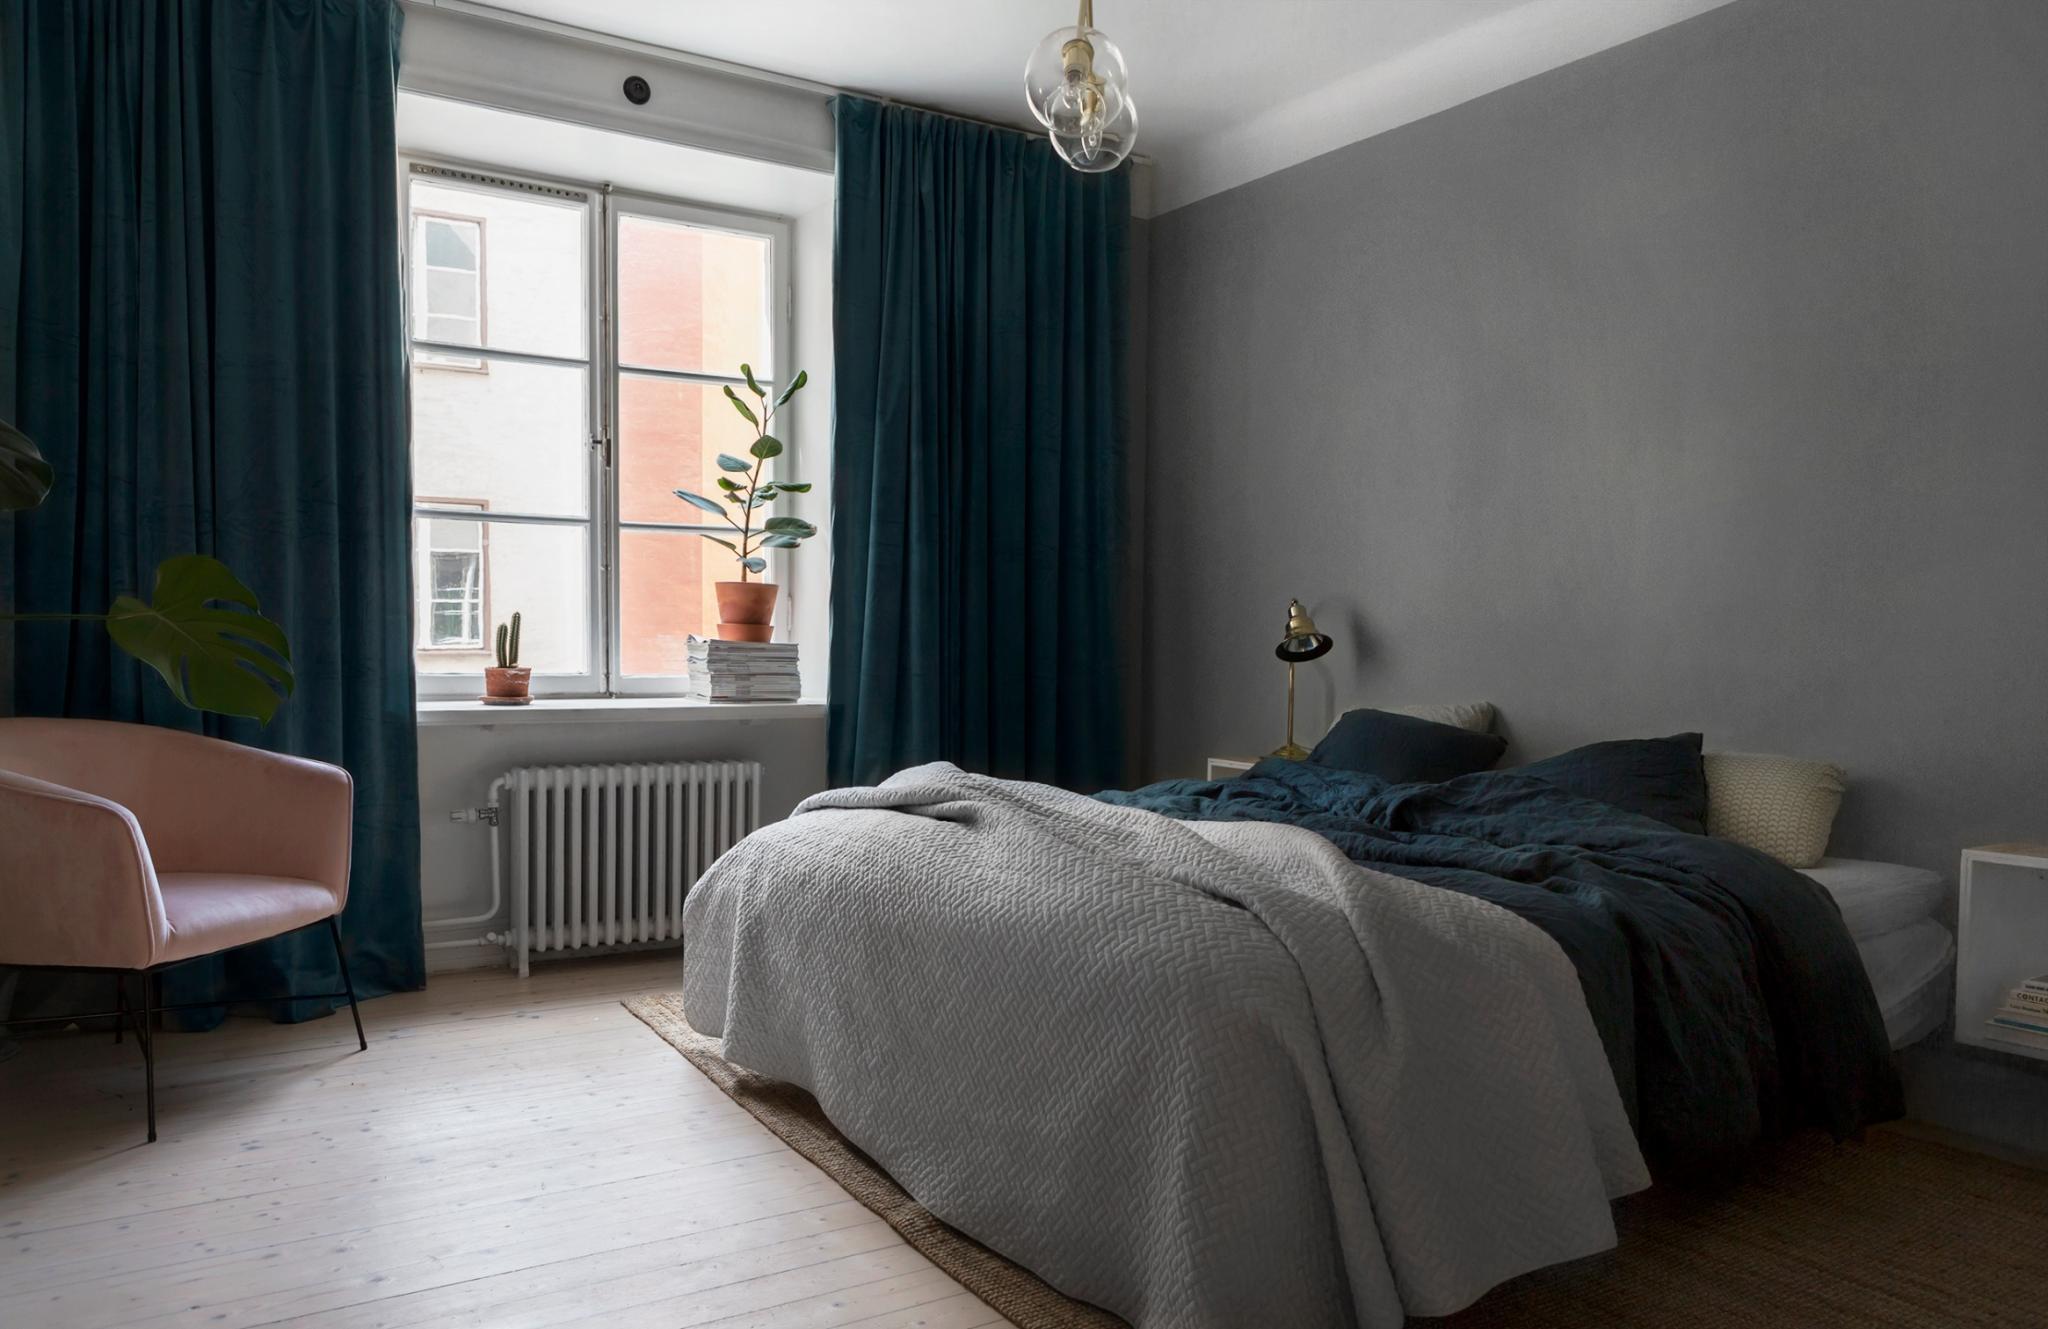 Picture of: Bedroom Sovevaerelse Boligindretning Bolig Indretning Boligcious